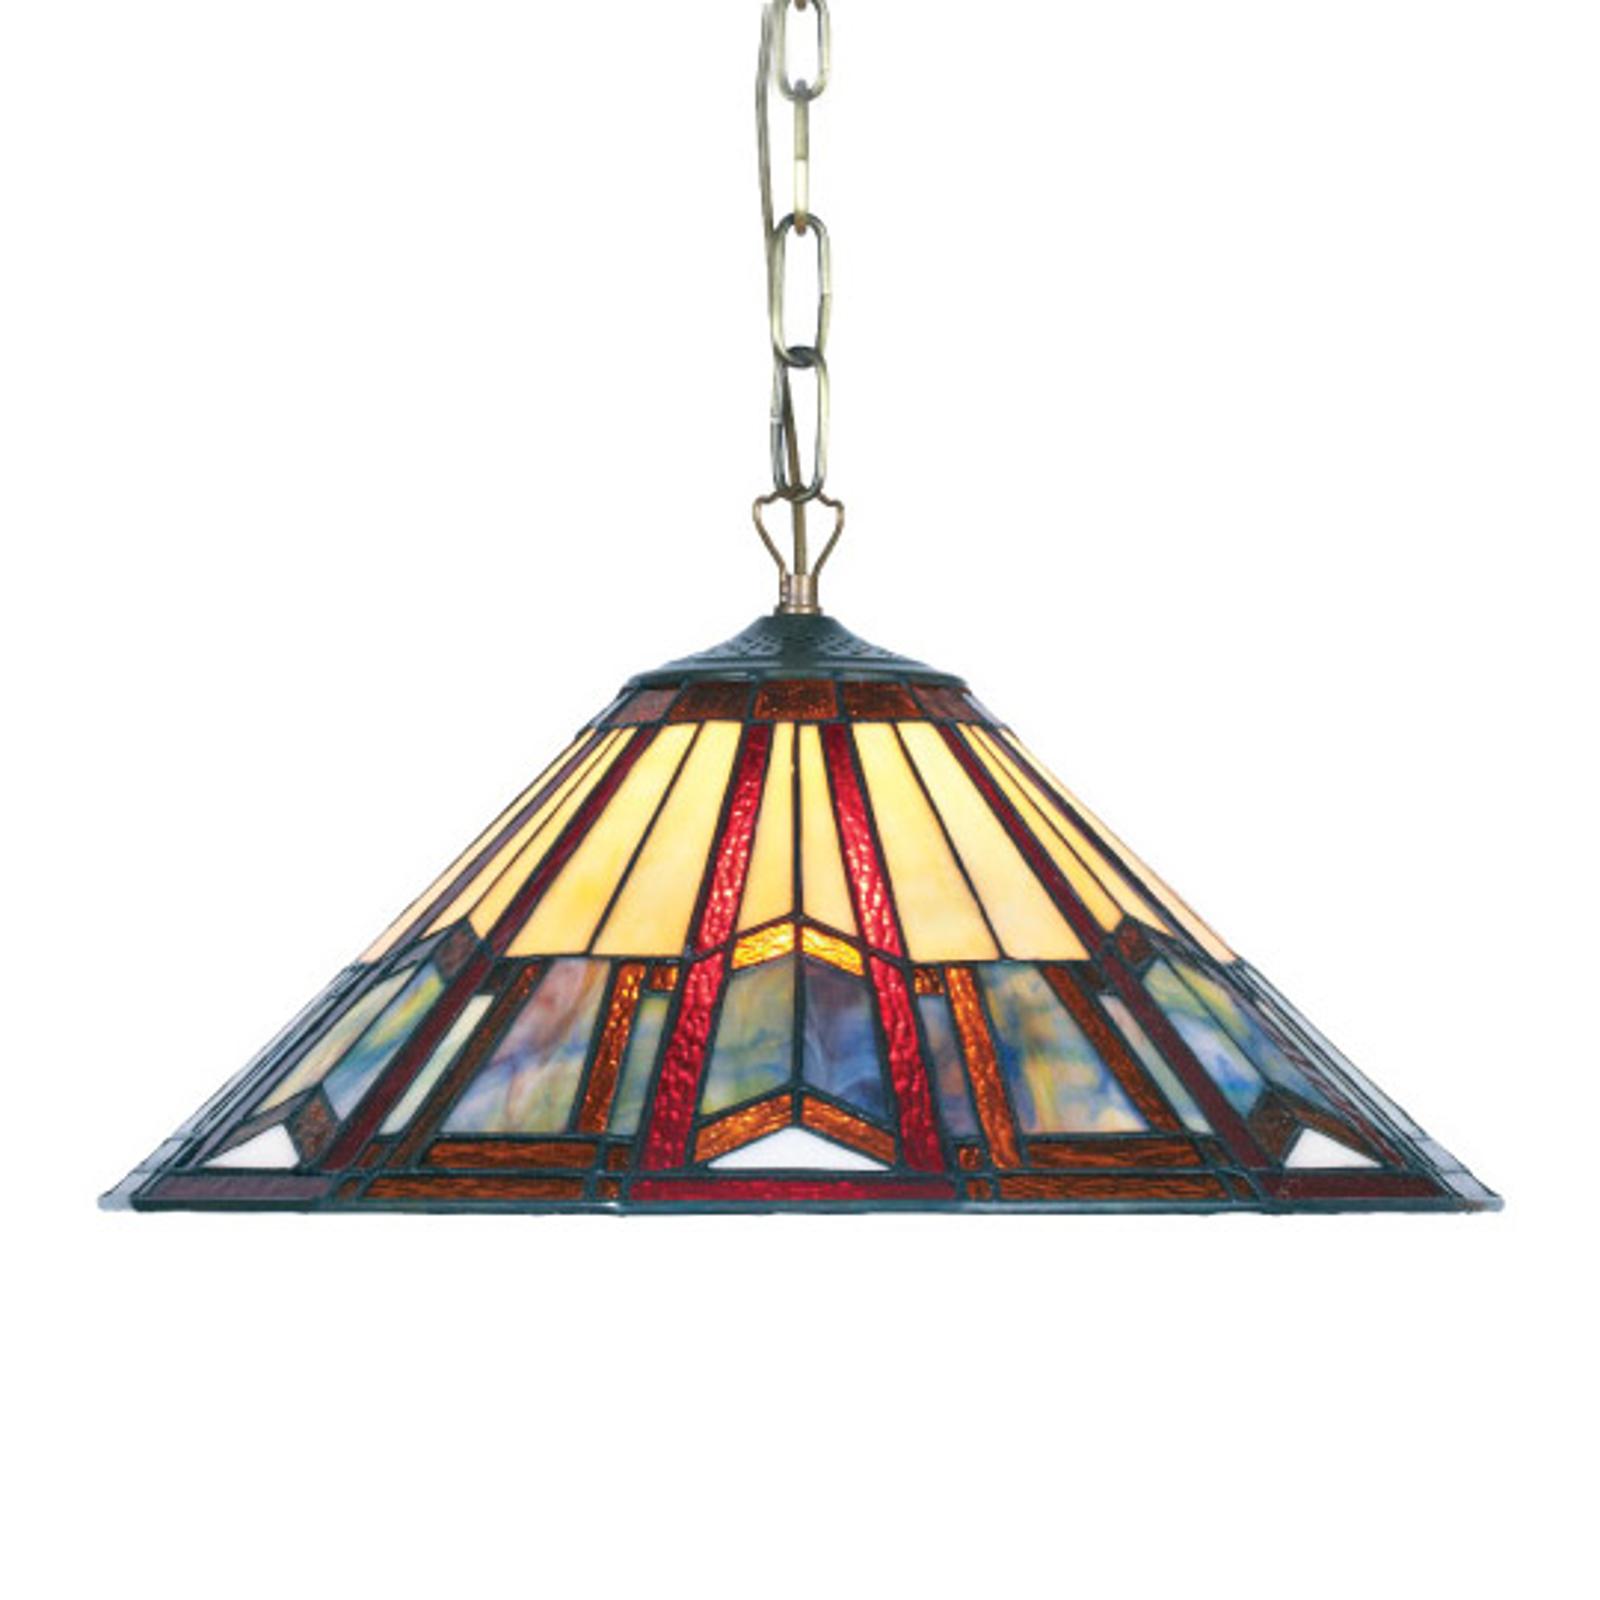 Hanglamp LILLIE in Tiffany-stijl 2 x E27